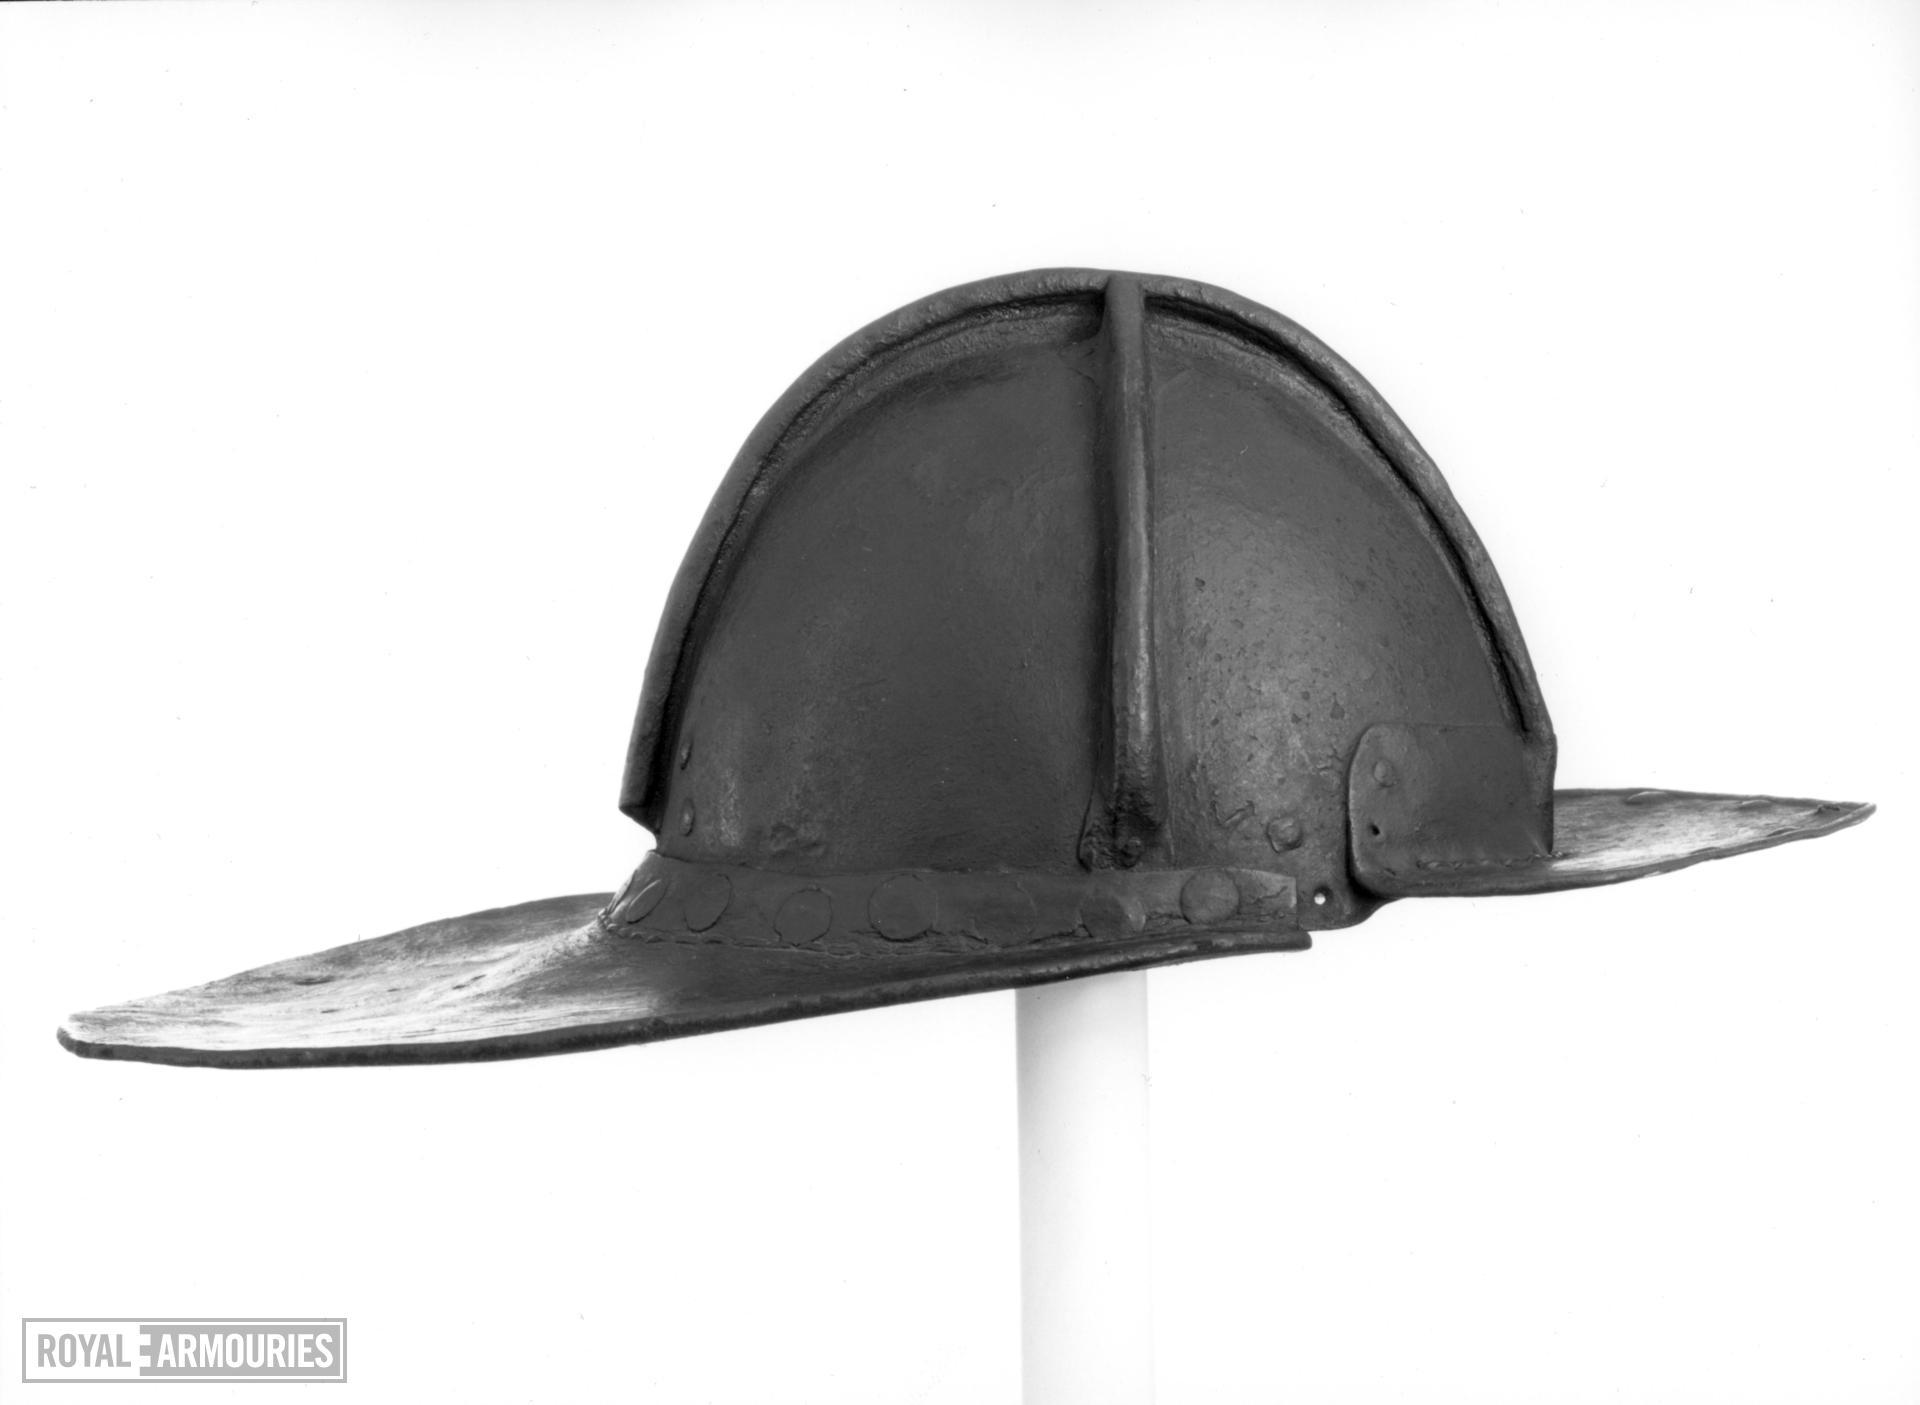 Sapper's helmet